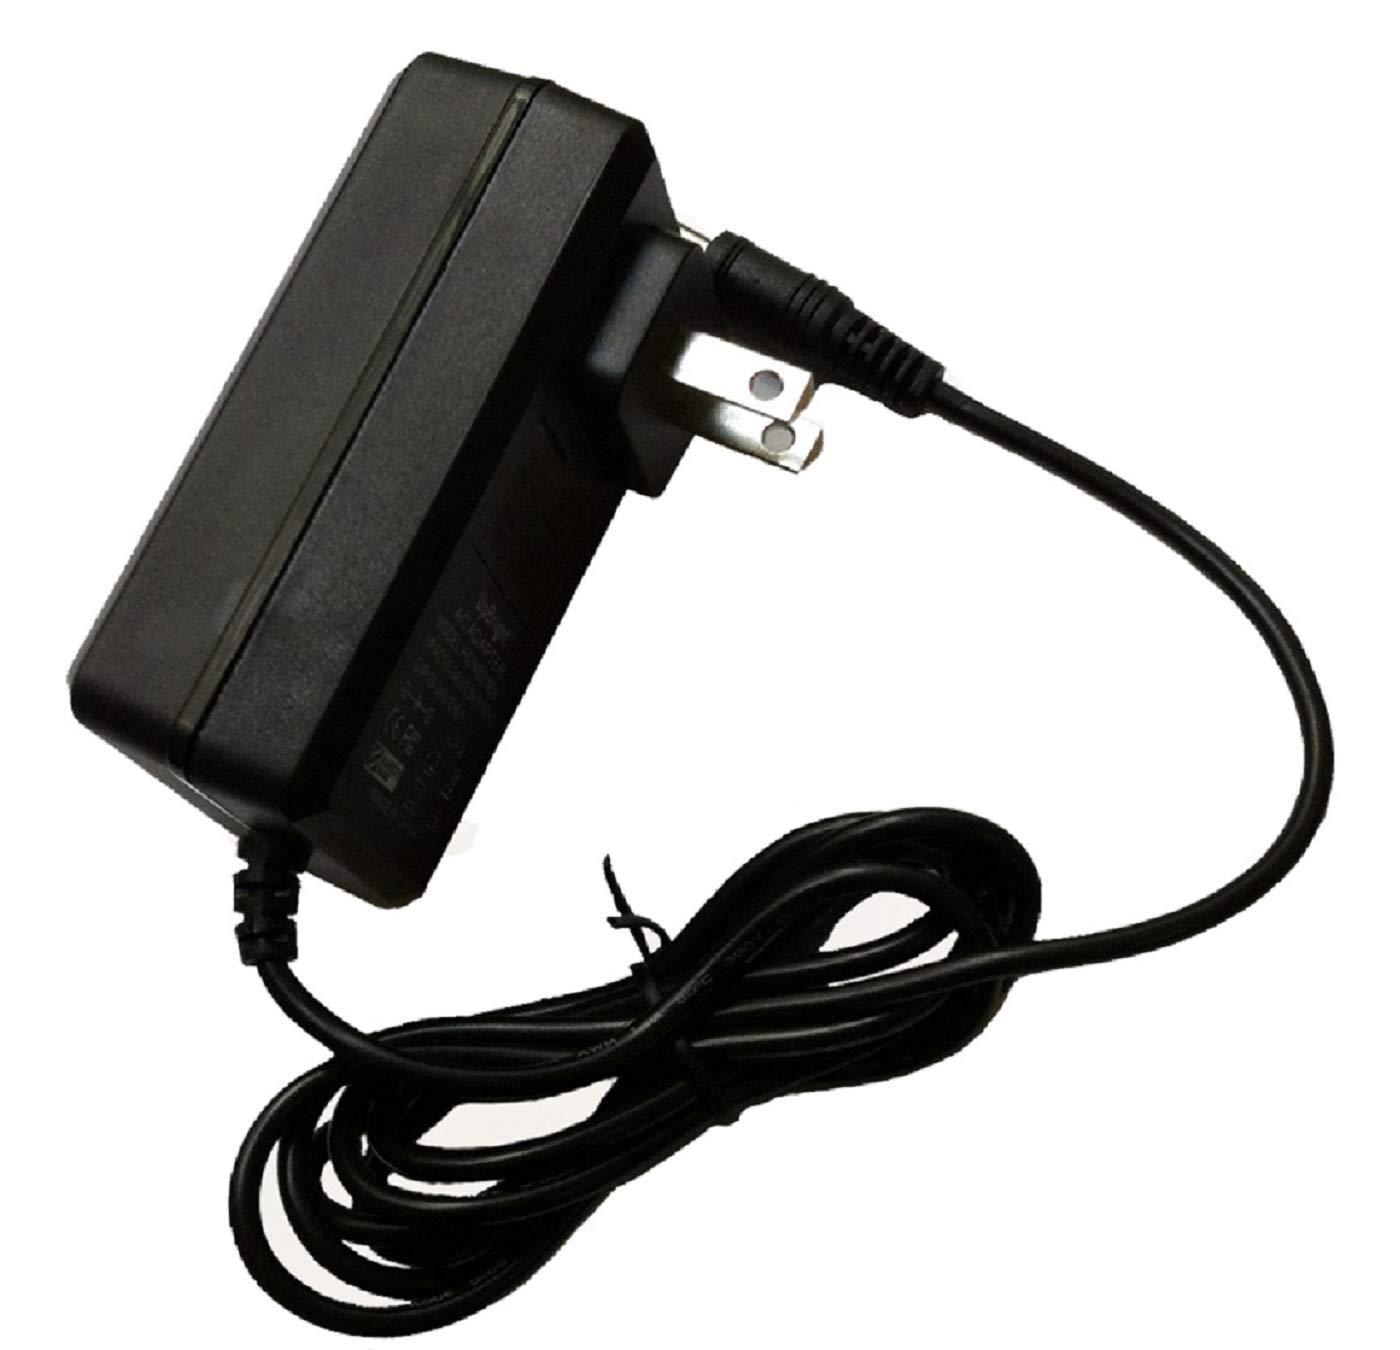 AC//DC Adapter For Ion Audio Solar Stone Wireless Solar Garden Speaker Power Cord